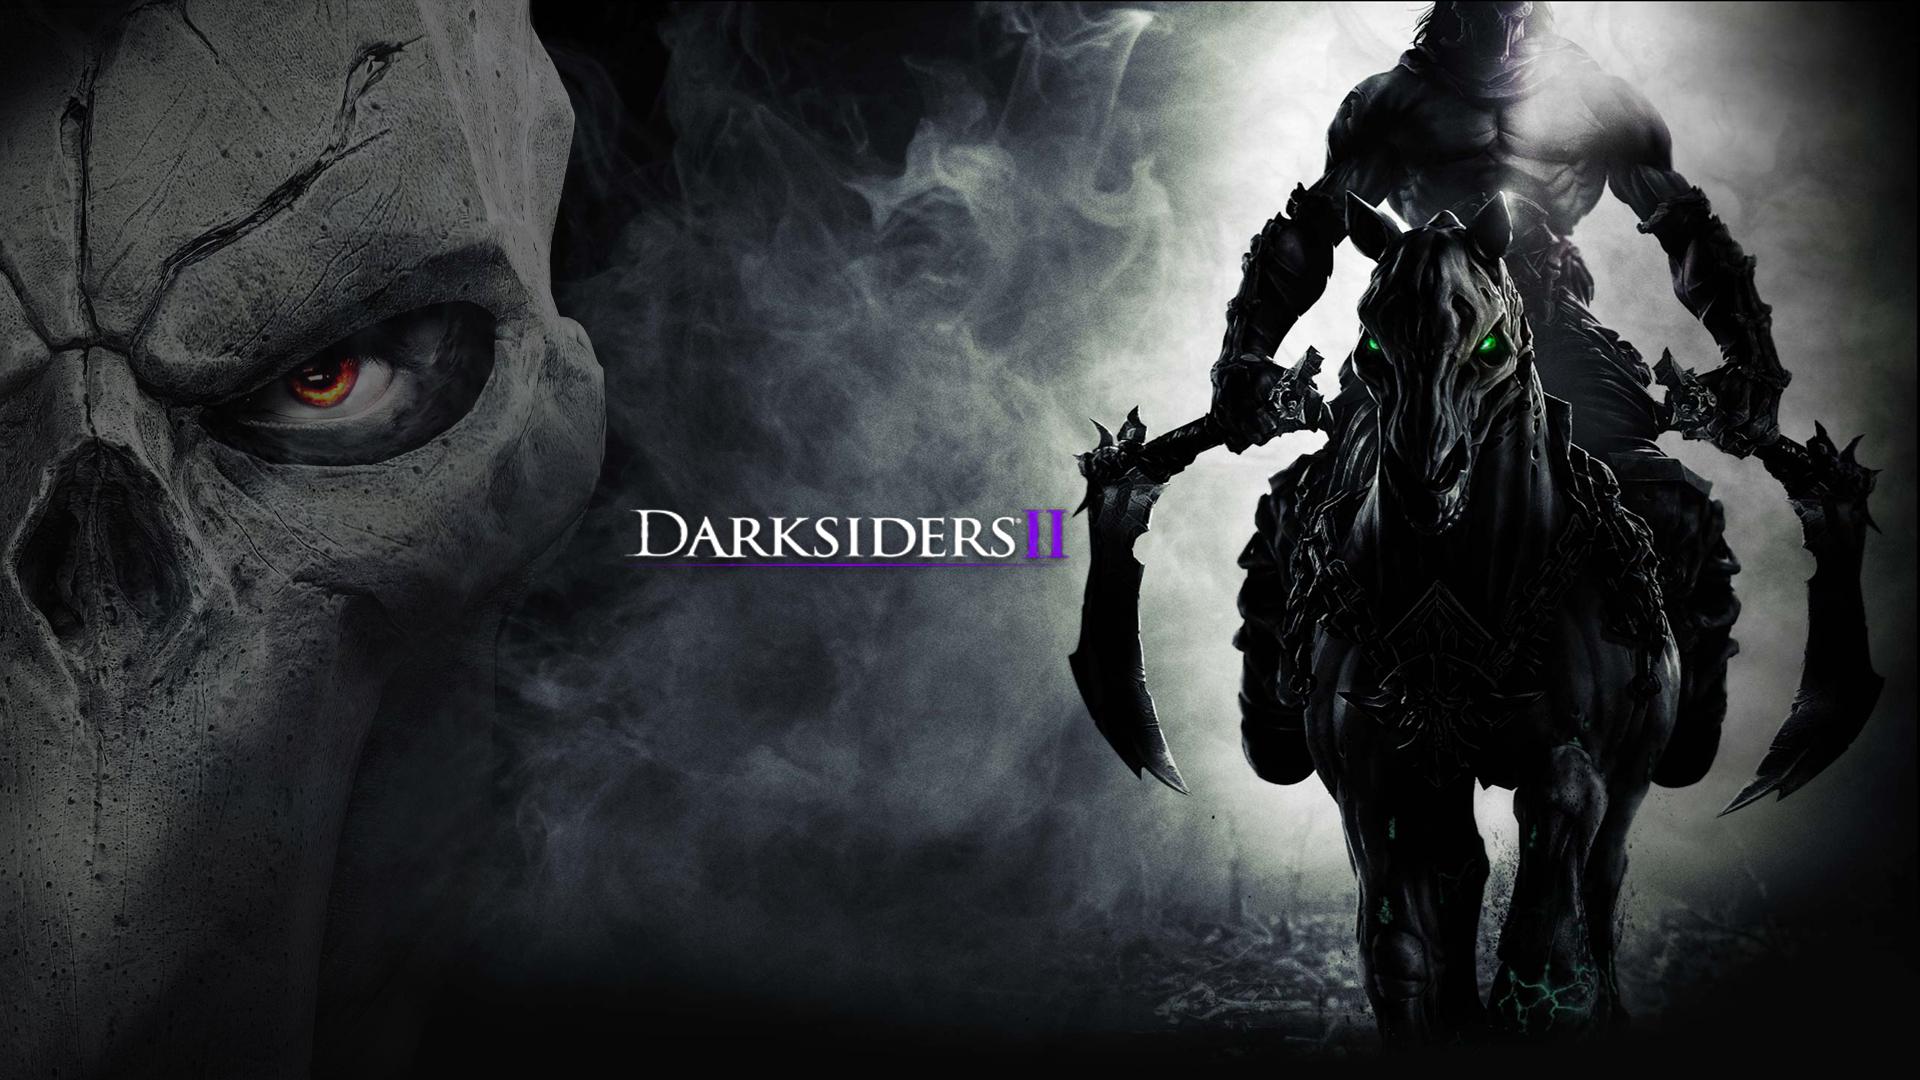 Аватарки darksiders 2, бесплатные фото, обои ...: pictures11.ru/avatarki-darksiders-2.html